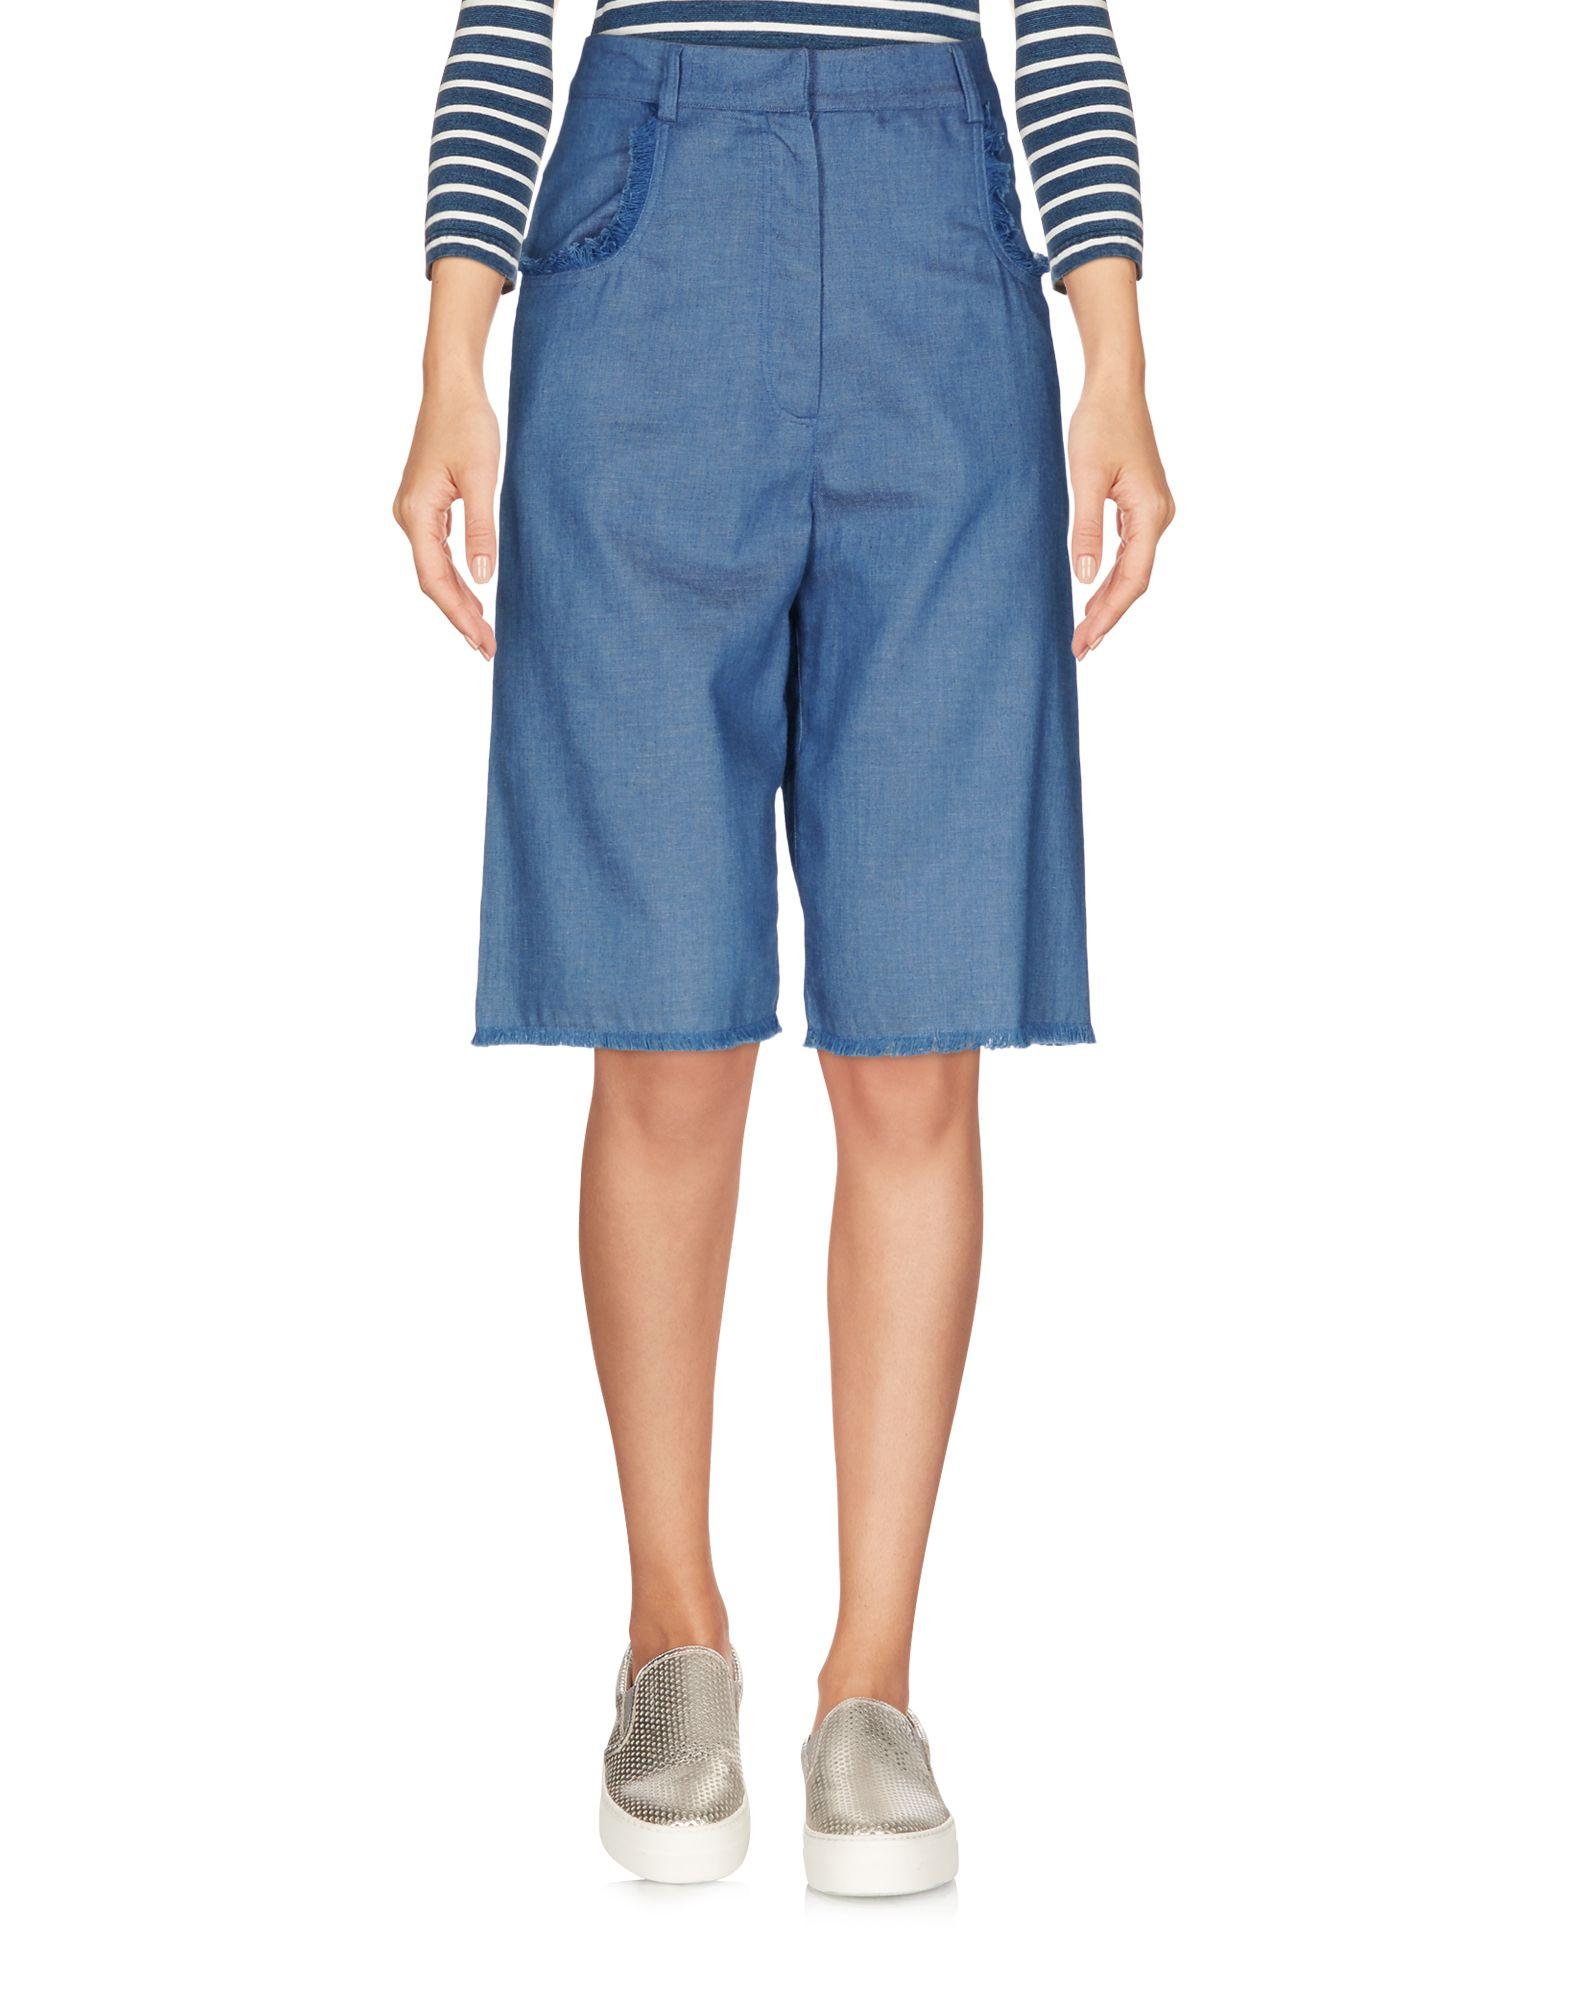 AMERICAN RETRO Denim Shorts in Blue